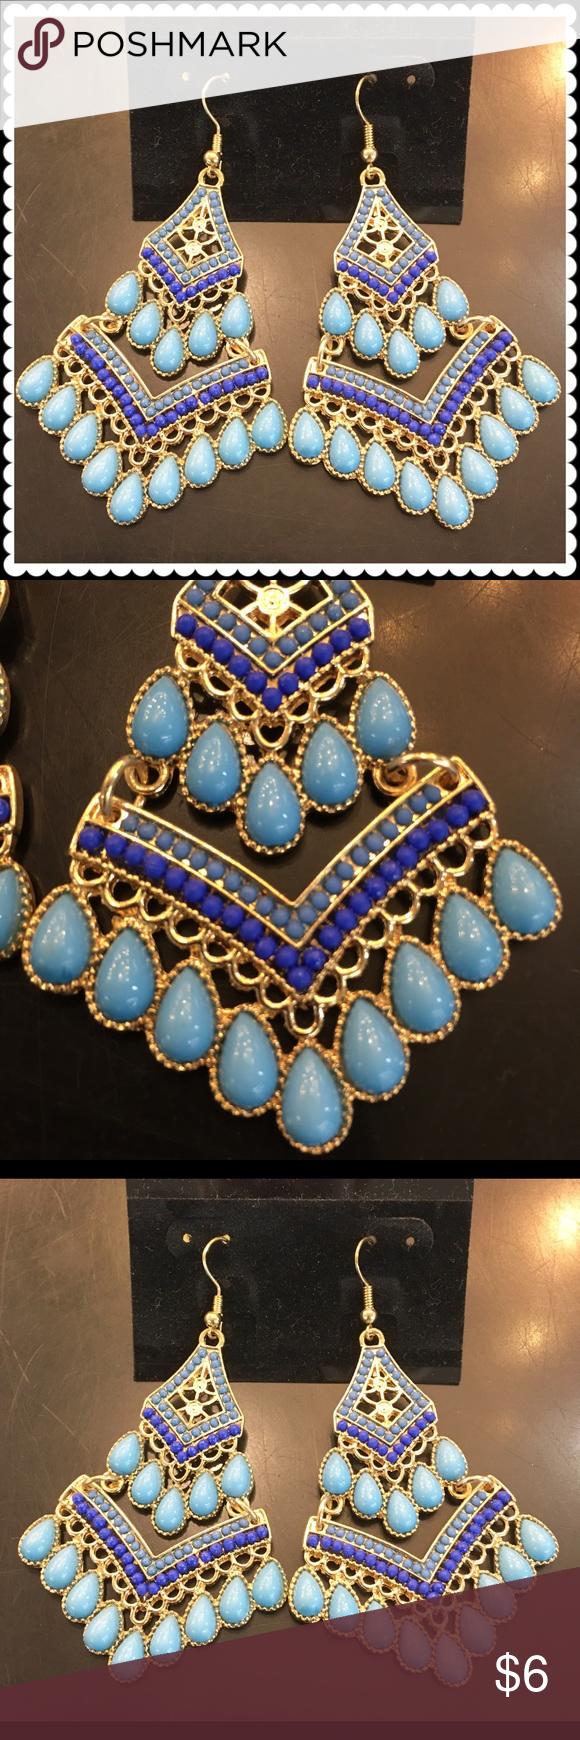 Blue fish hook dangle earrings Turquoise/Blue dangle earrings Jewelry Earrings